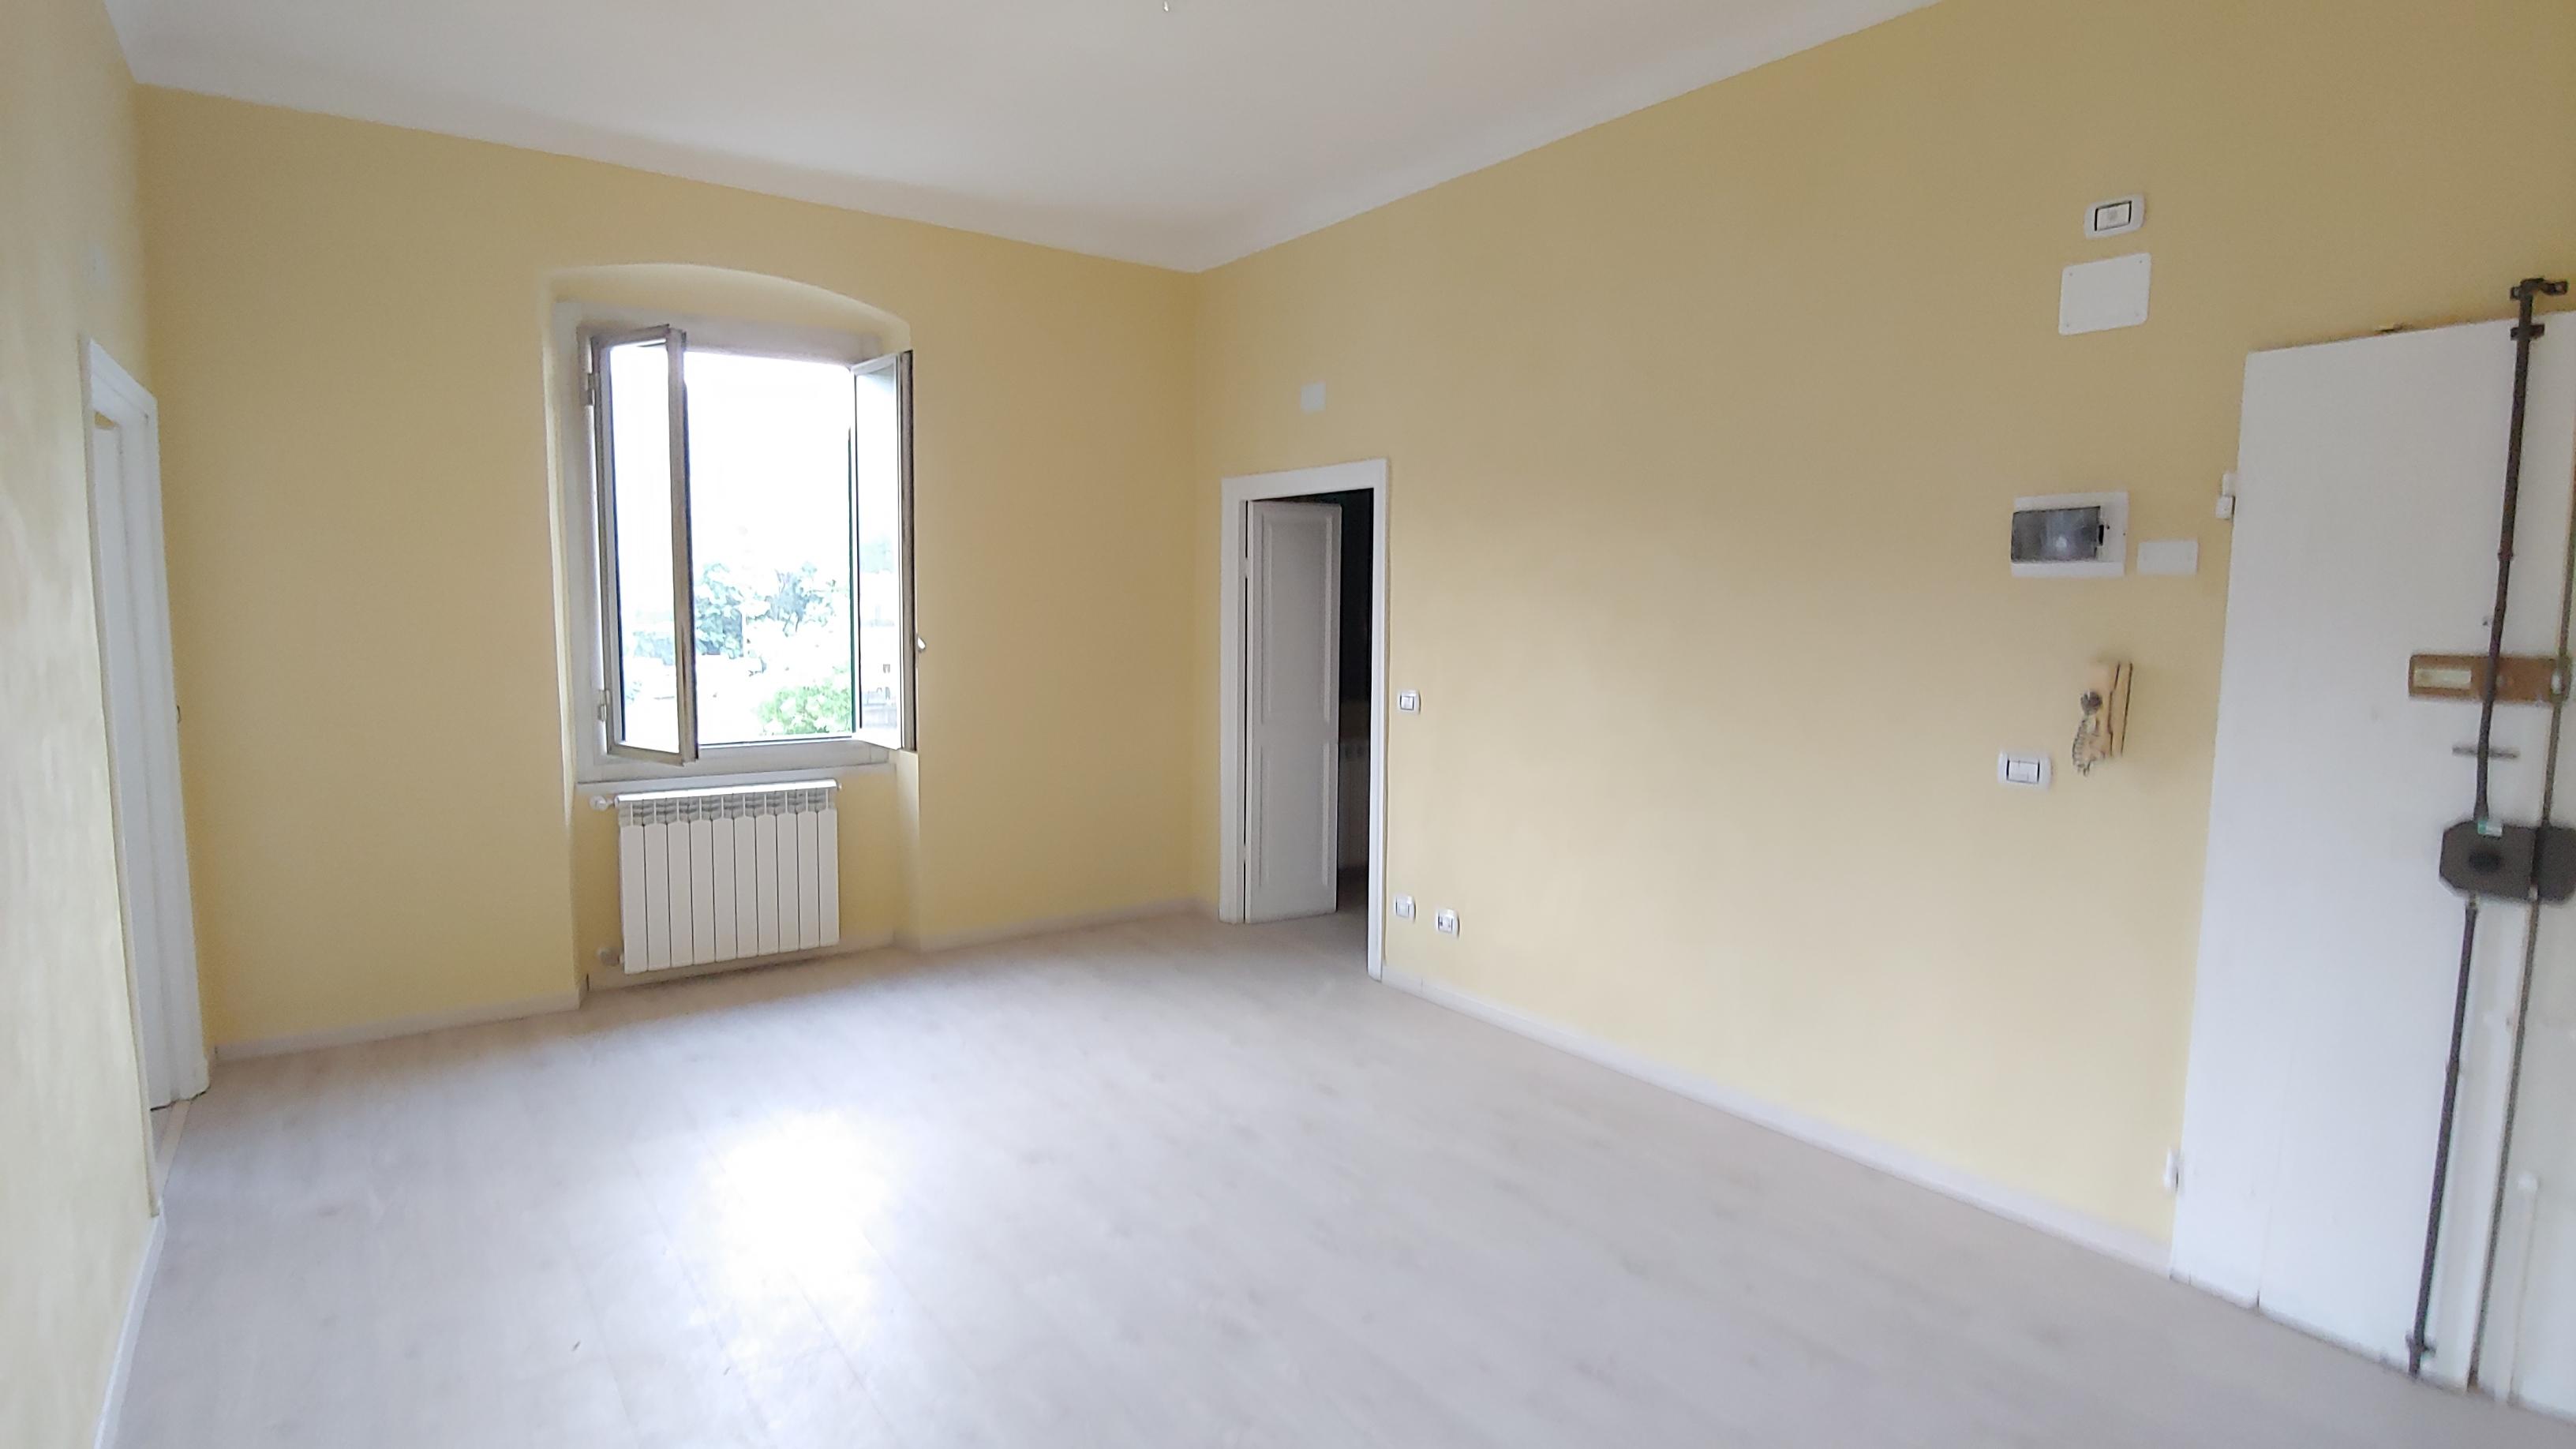 affitto appartamento via sardorella bolzaneto